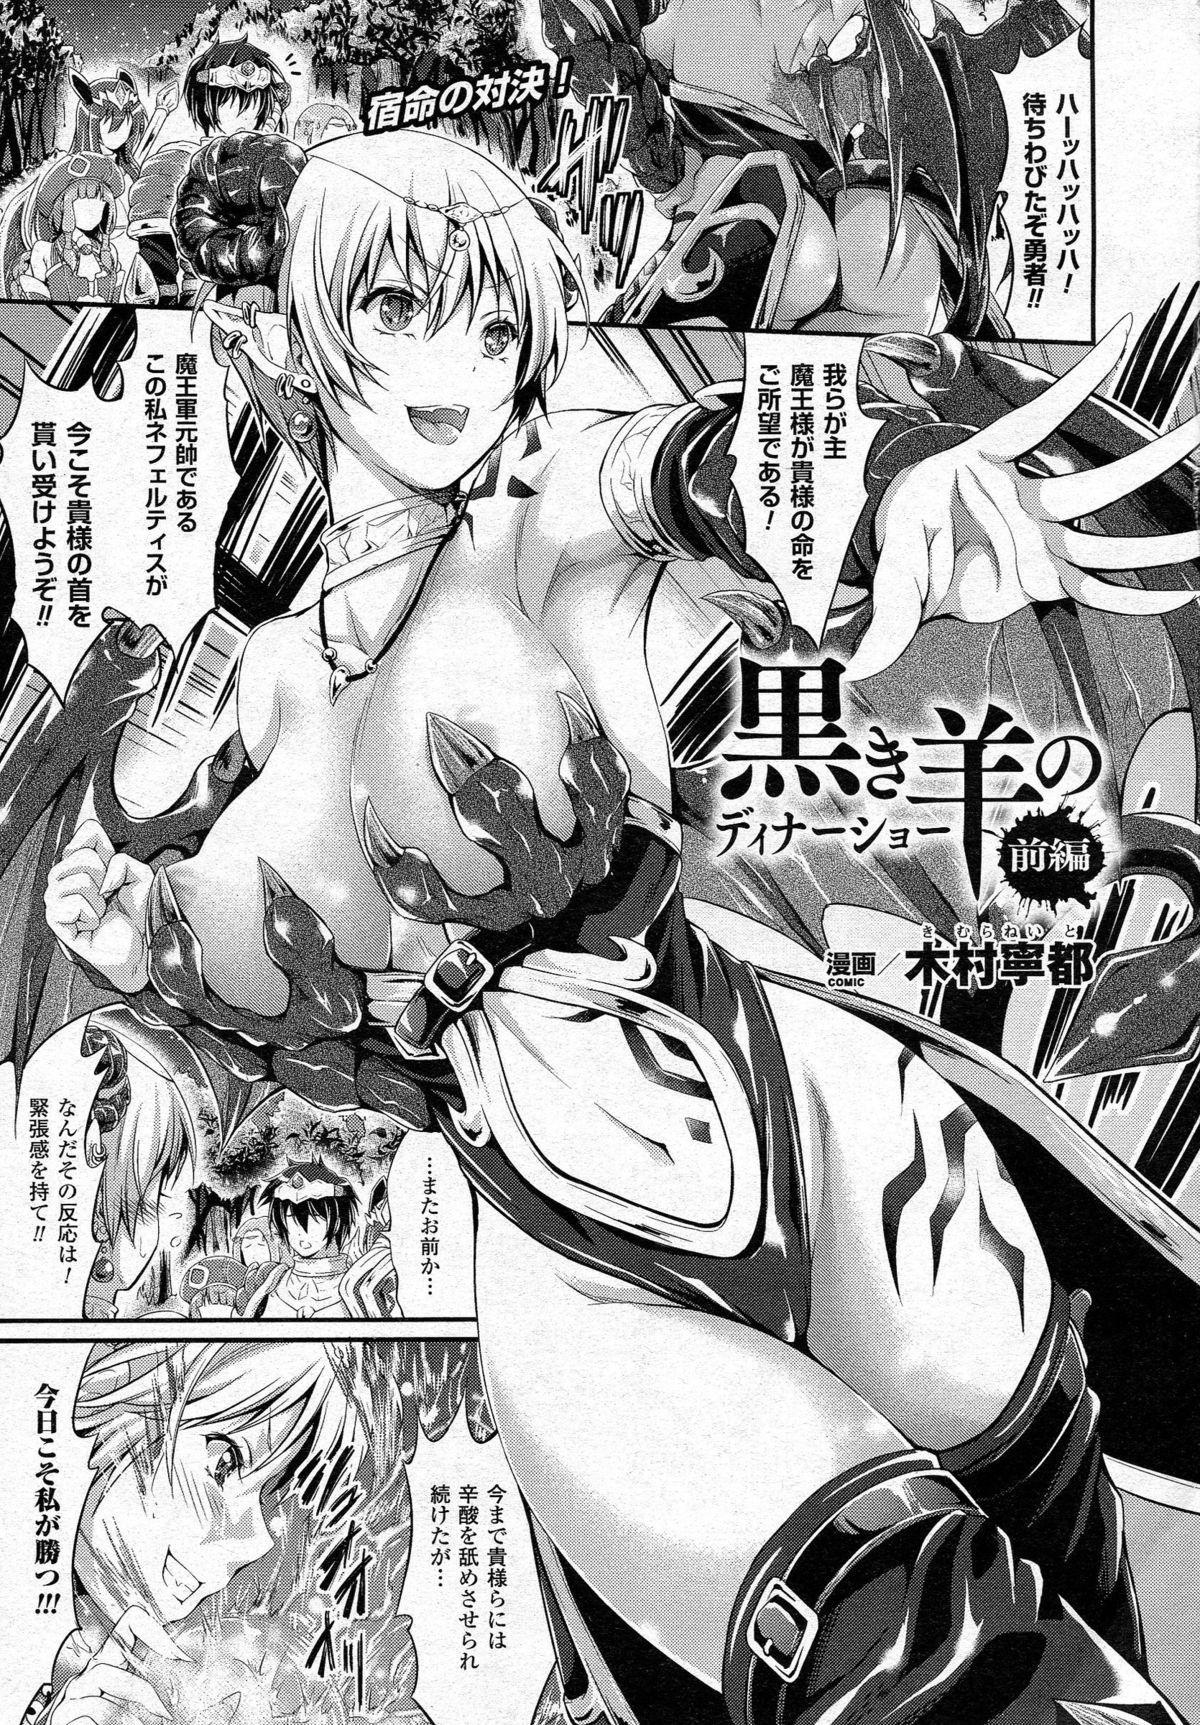 COMIC Unreal 2015-06 Vol. 55 + Hisasi Illust Shuu 374